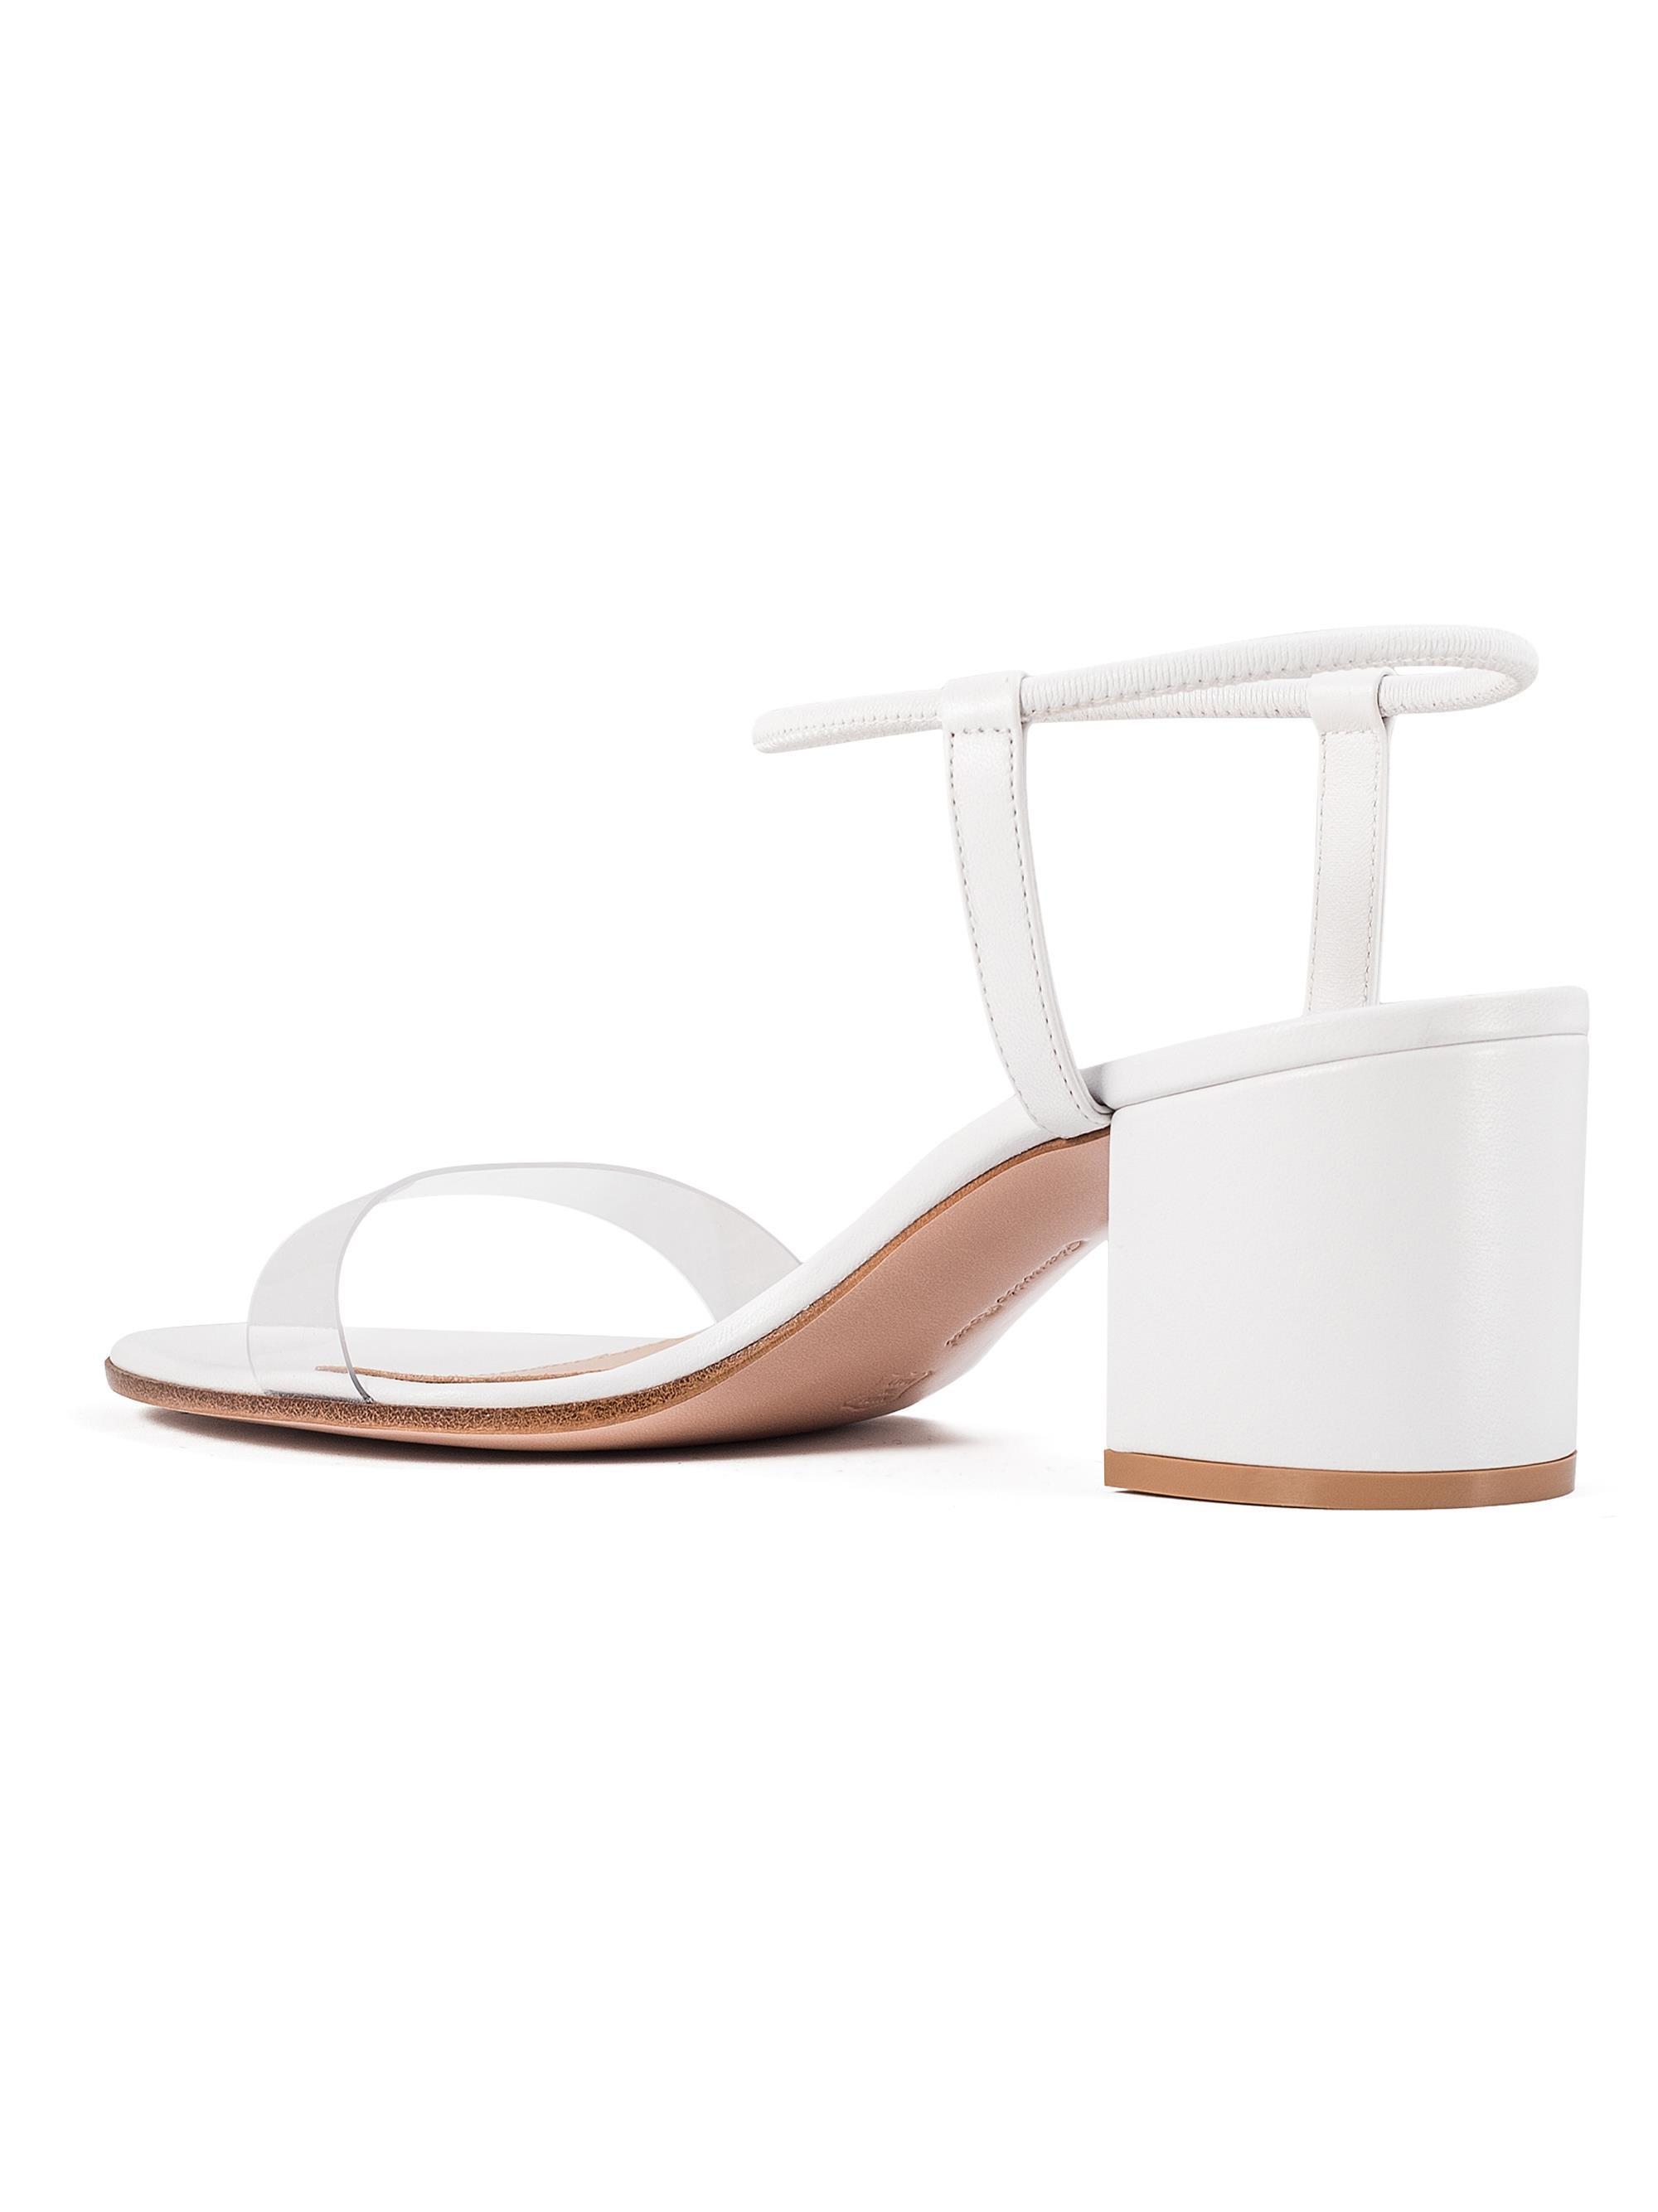 47159b0c4dd Gianvito Rossi - White Transparent Strap Sandals - Lyst. View fullscreen